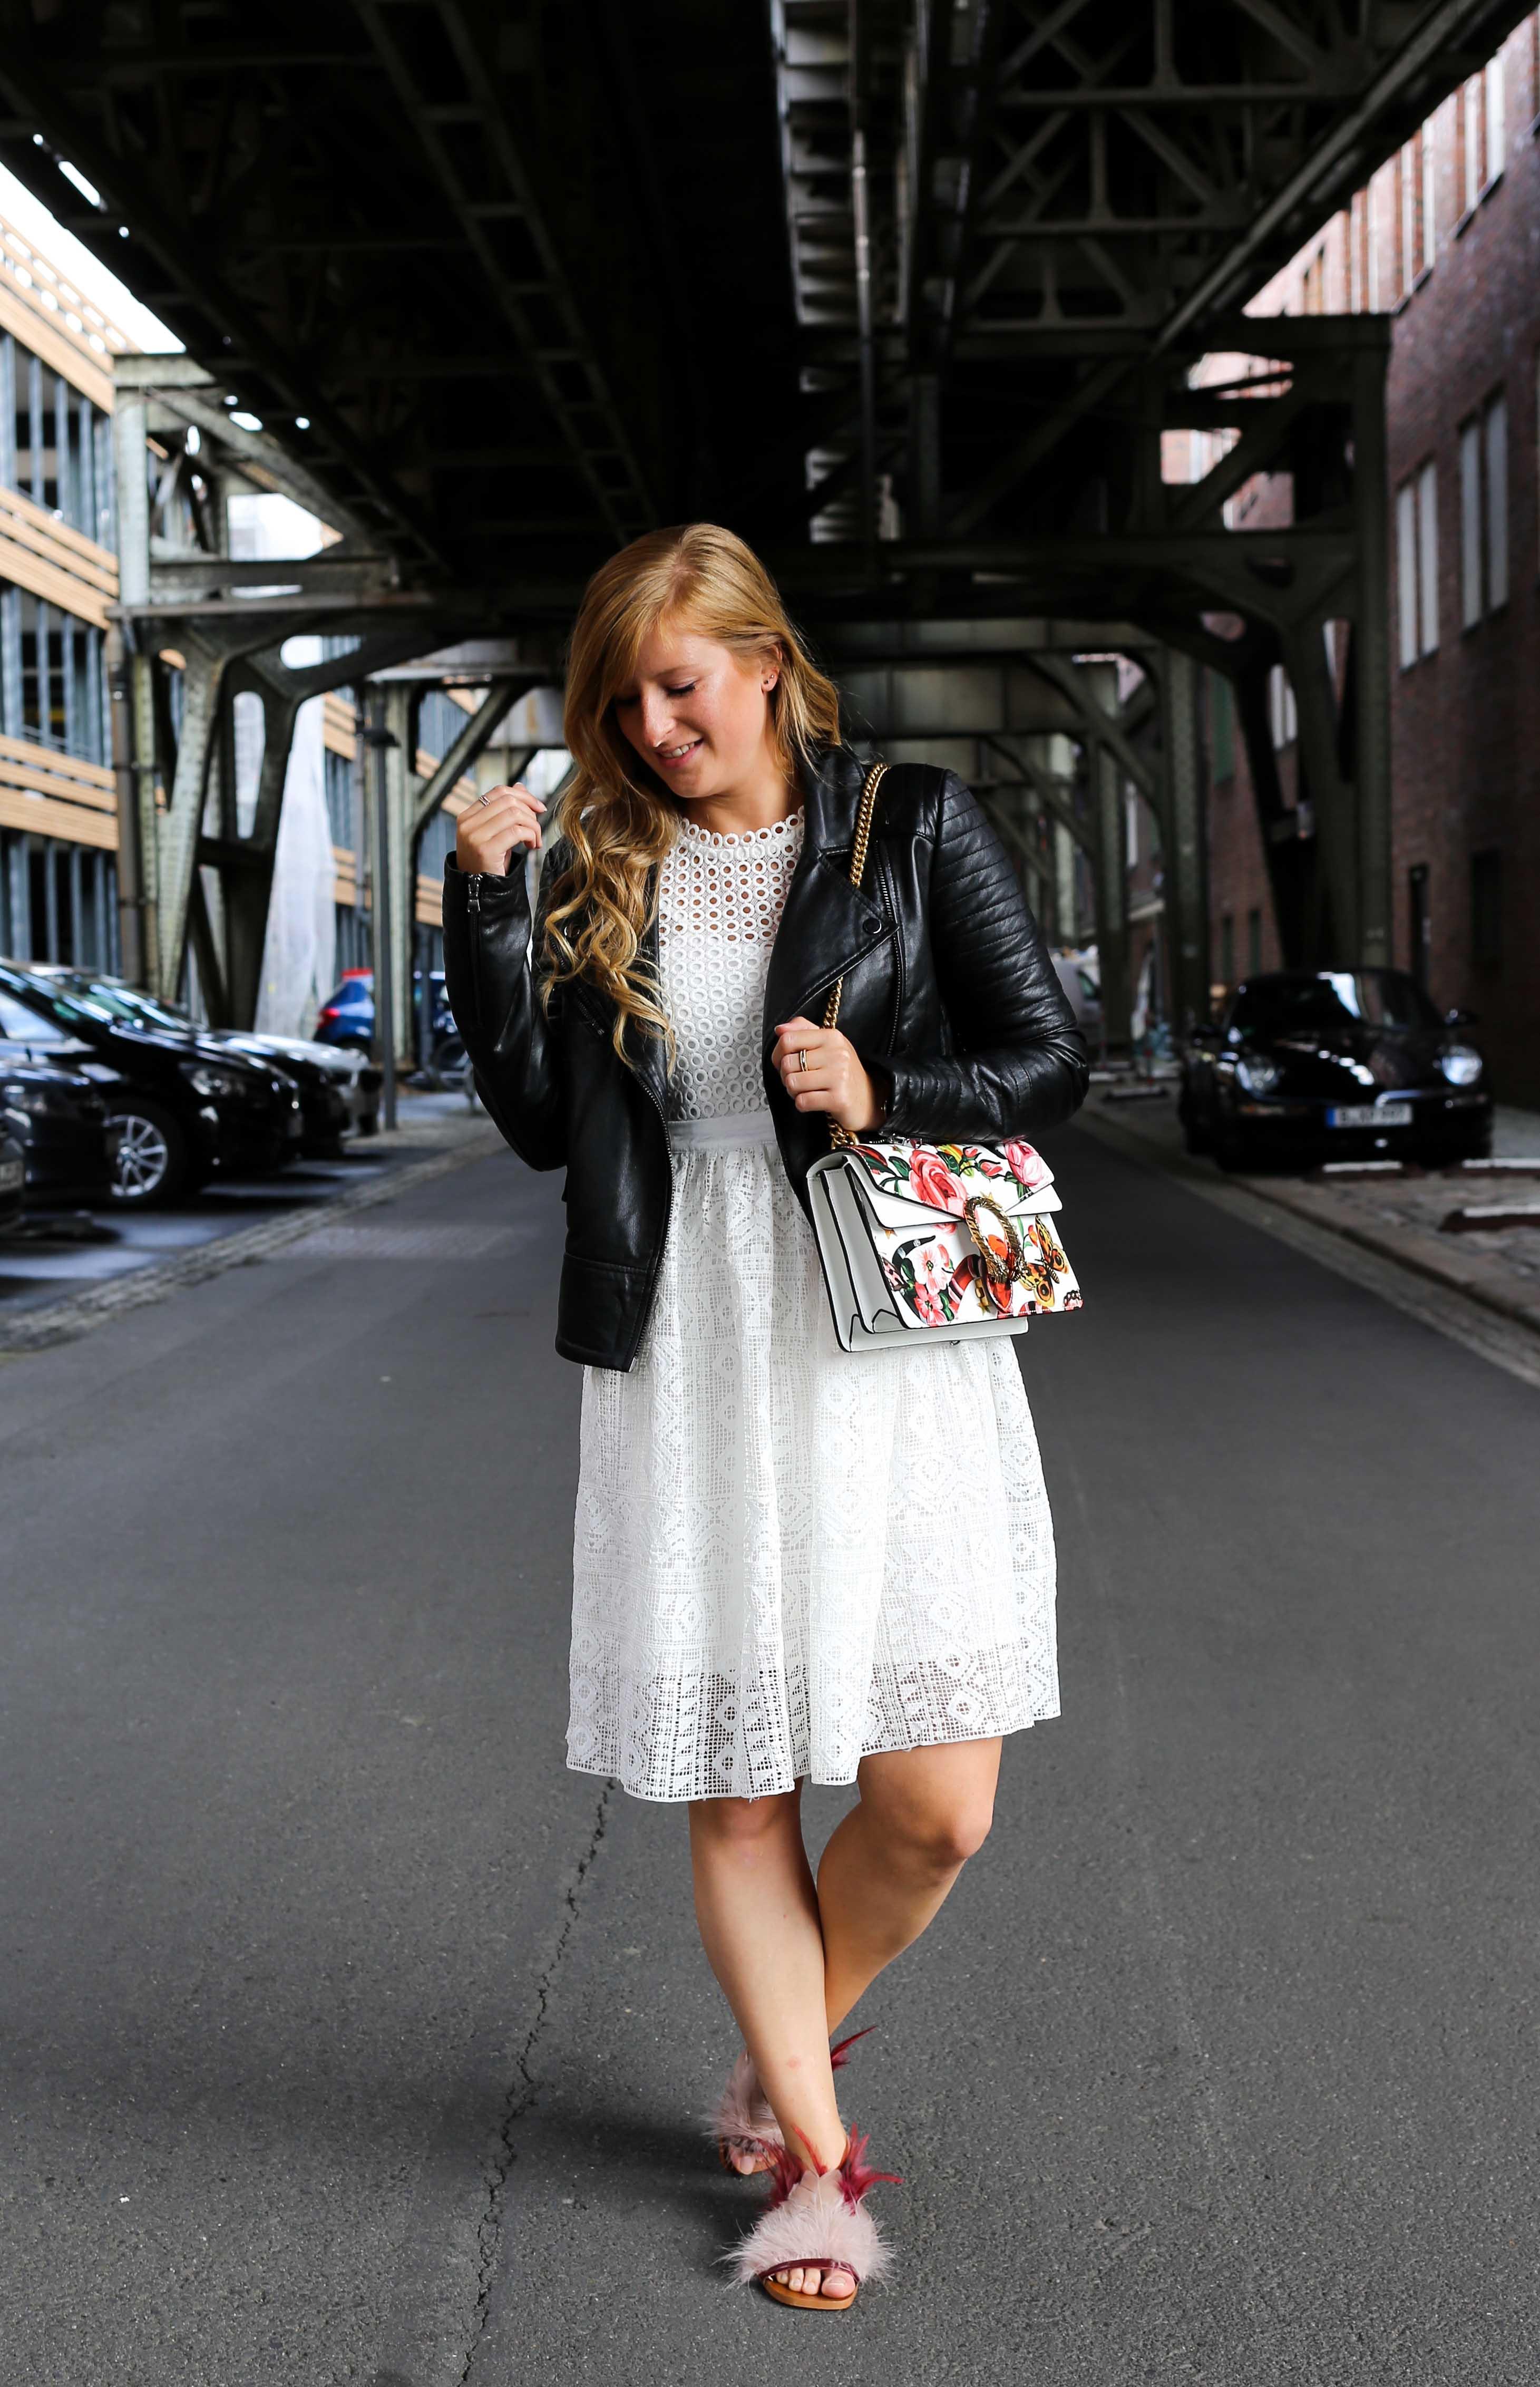 Fashion Week Outfit weißes Spitzenkleid Asos flache Ledersandalen mit Federn kombinieren Lederjacke Modeblog Deutschland Fashion Blogger OOTD 8